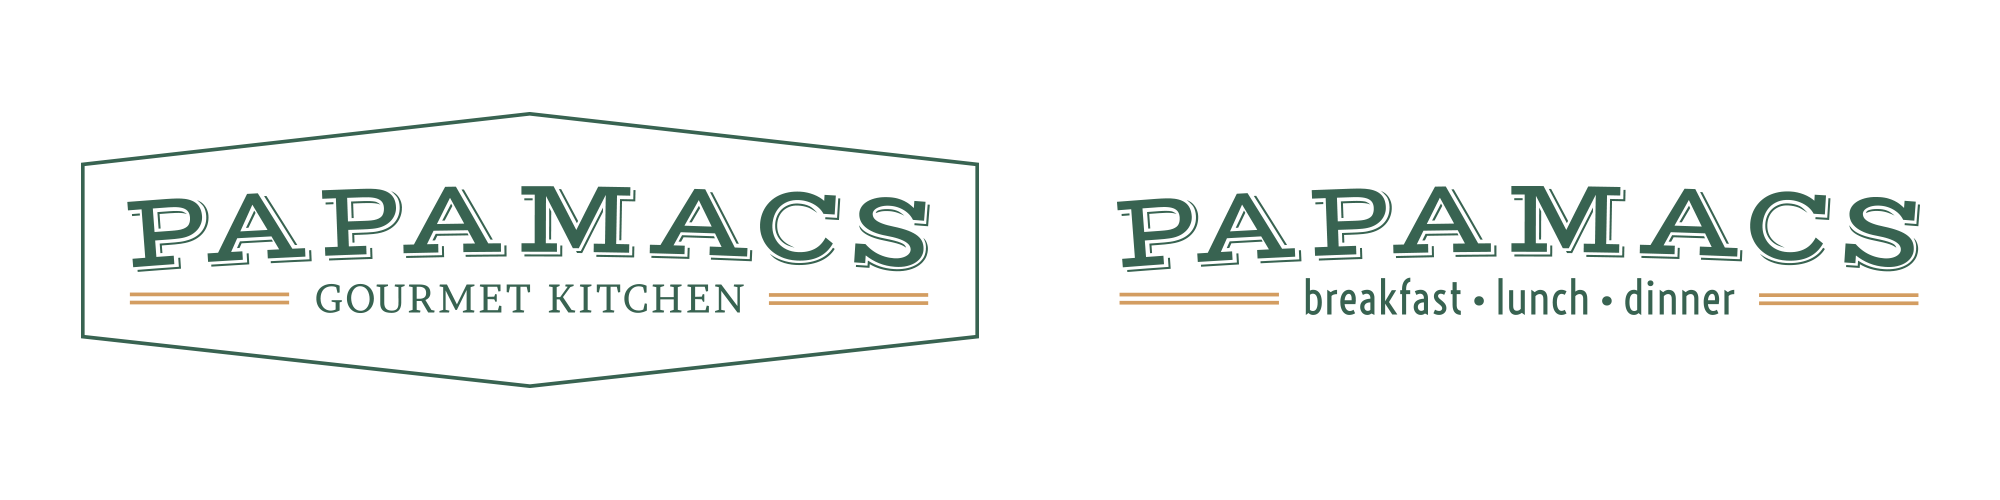 papamacs-gourmet-kitchen-restaurant-logo-glasgow,png